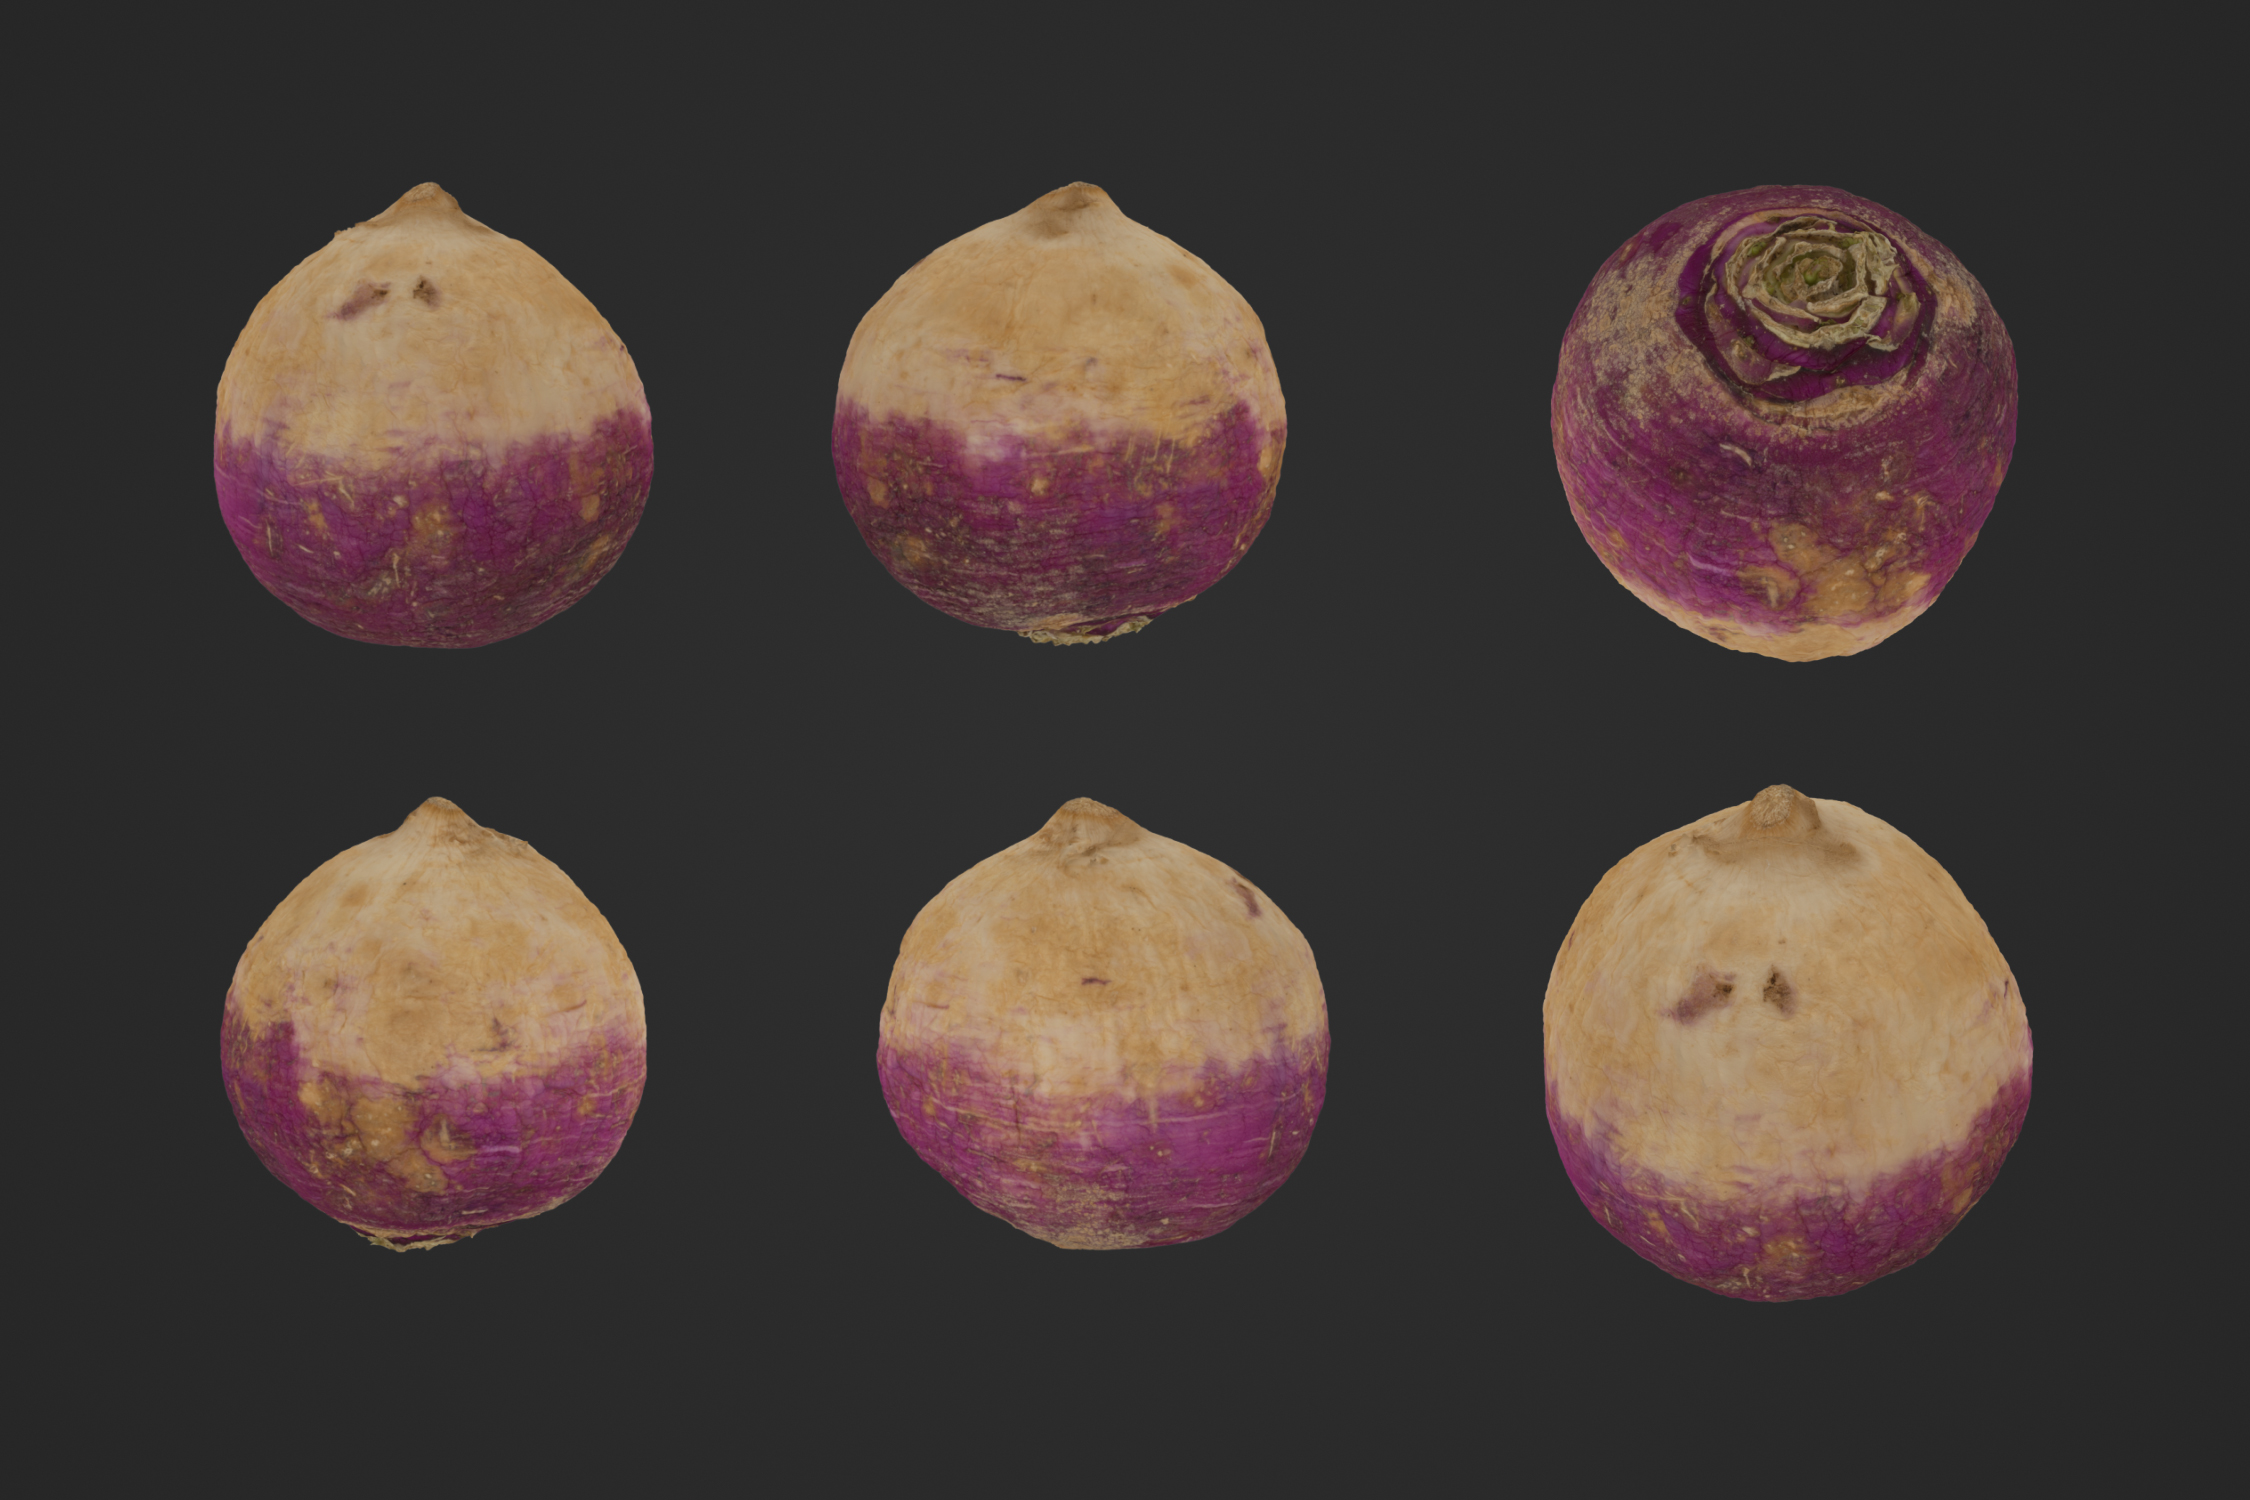 Turnip_1_1.jpg